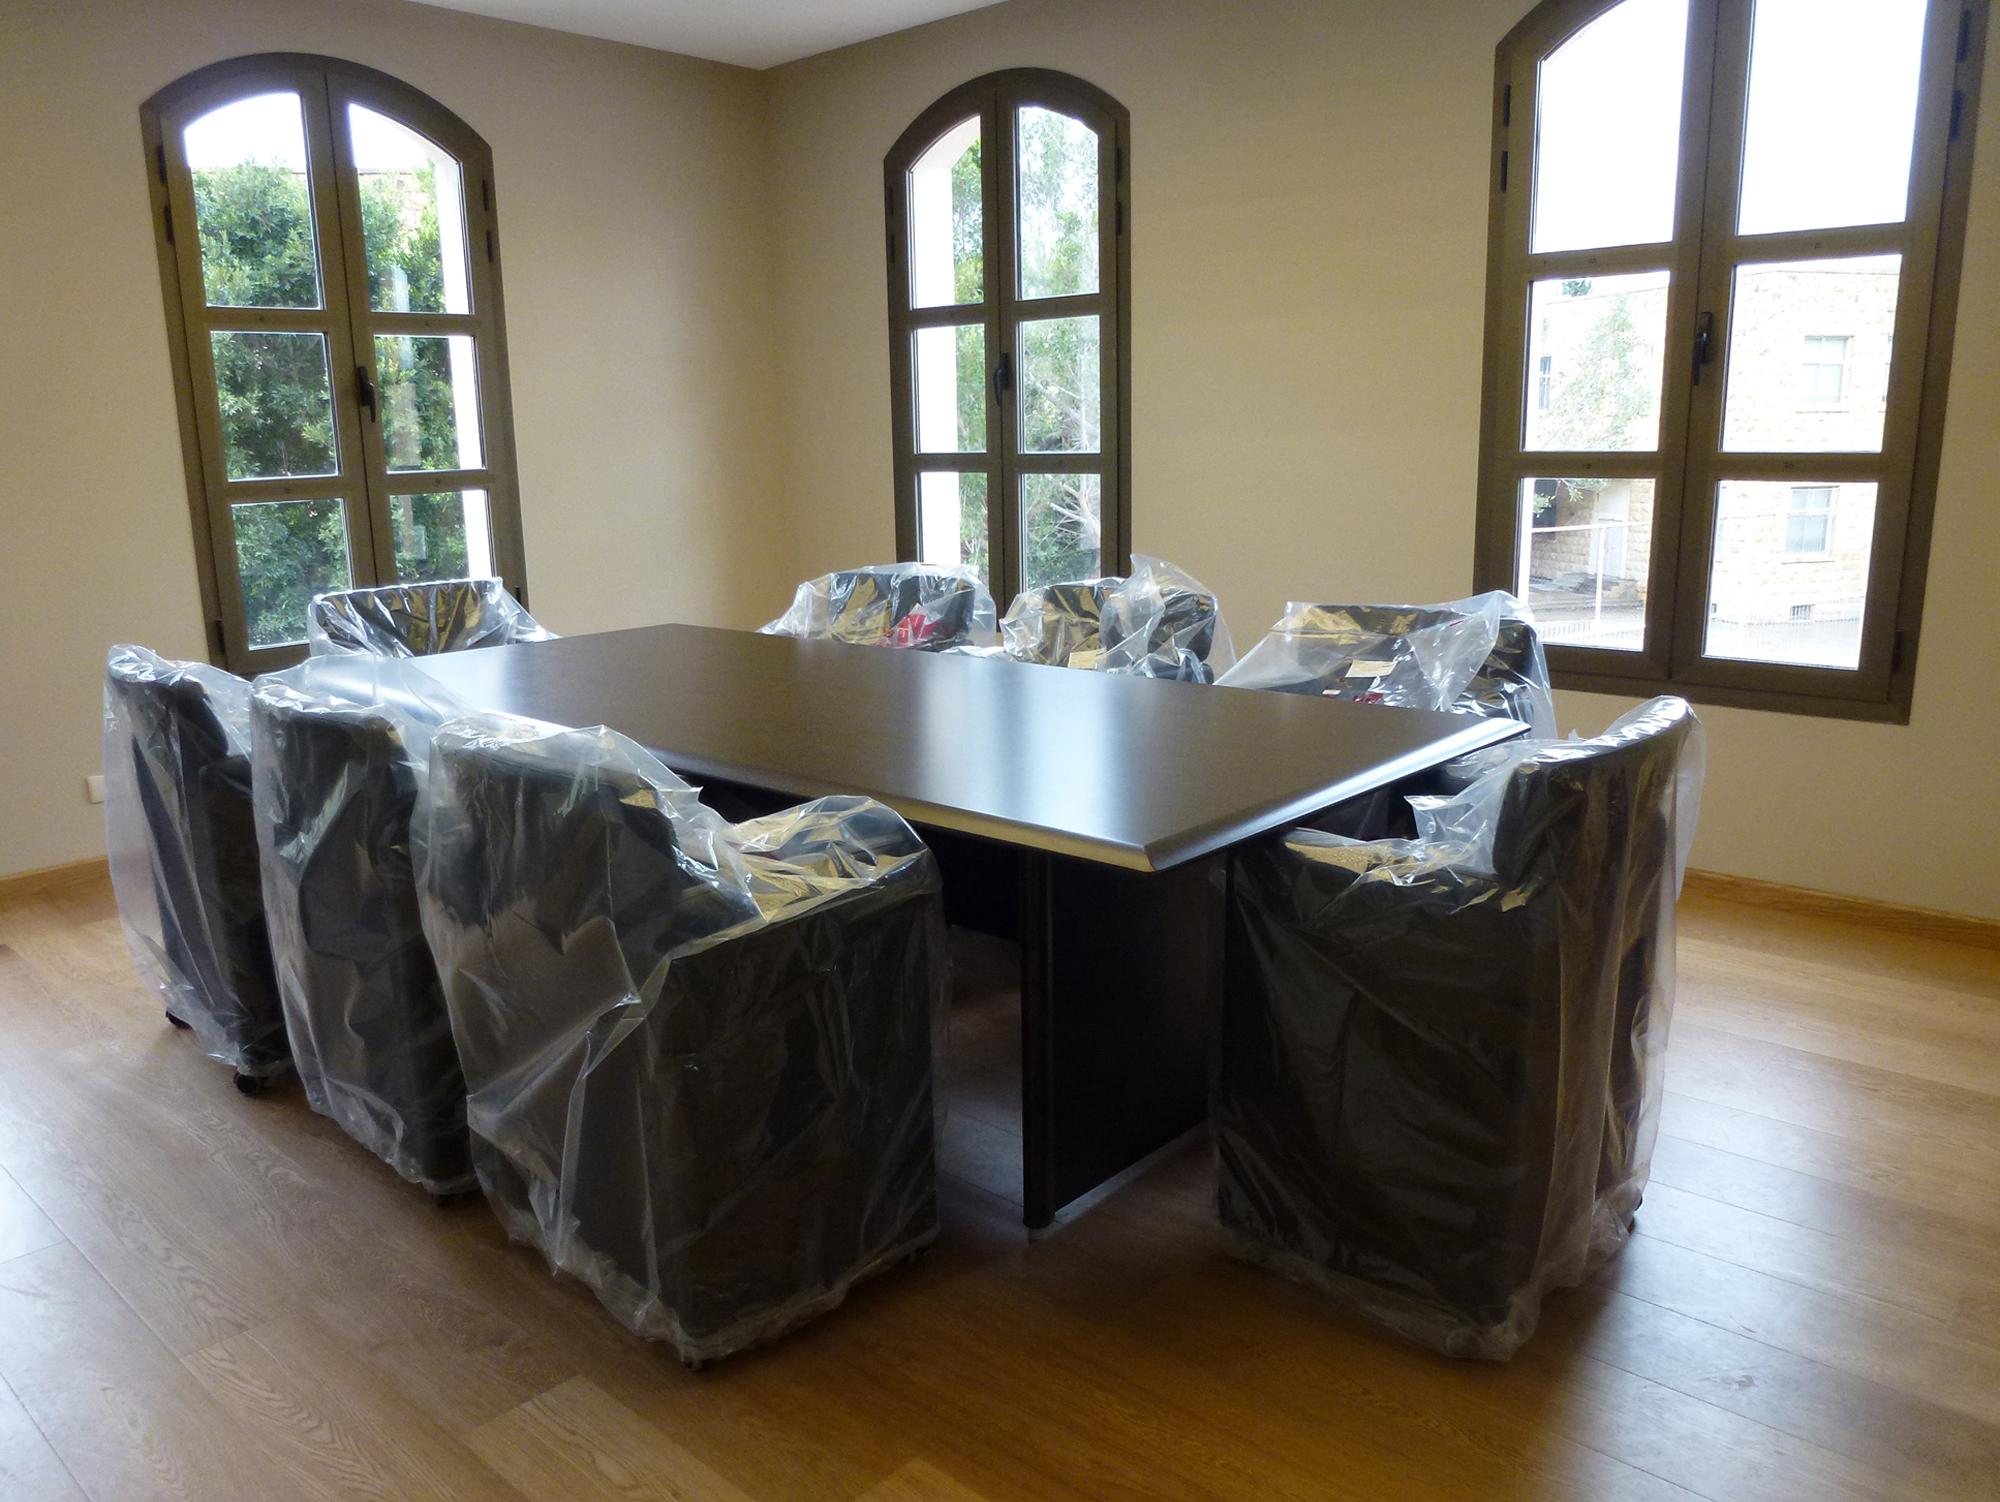 Uffici operativi beirut libano d 39 amico design for Uffici operativi